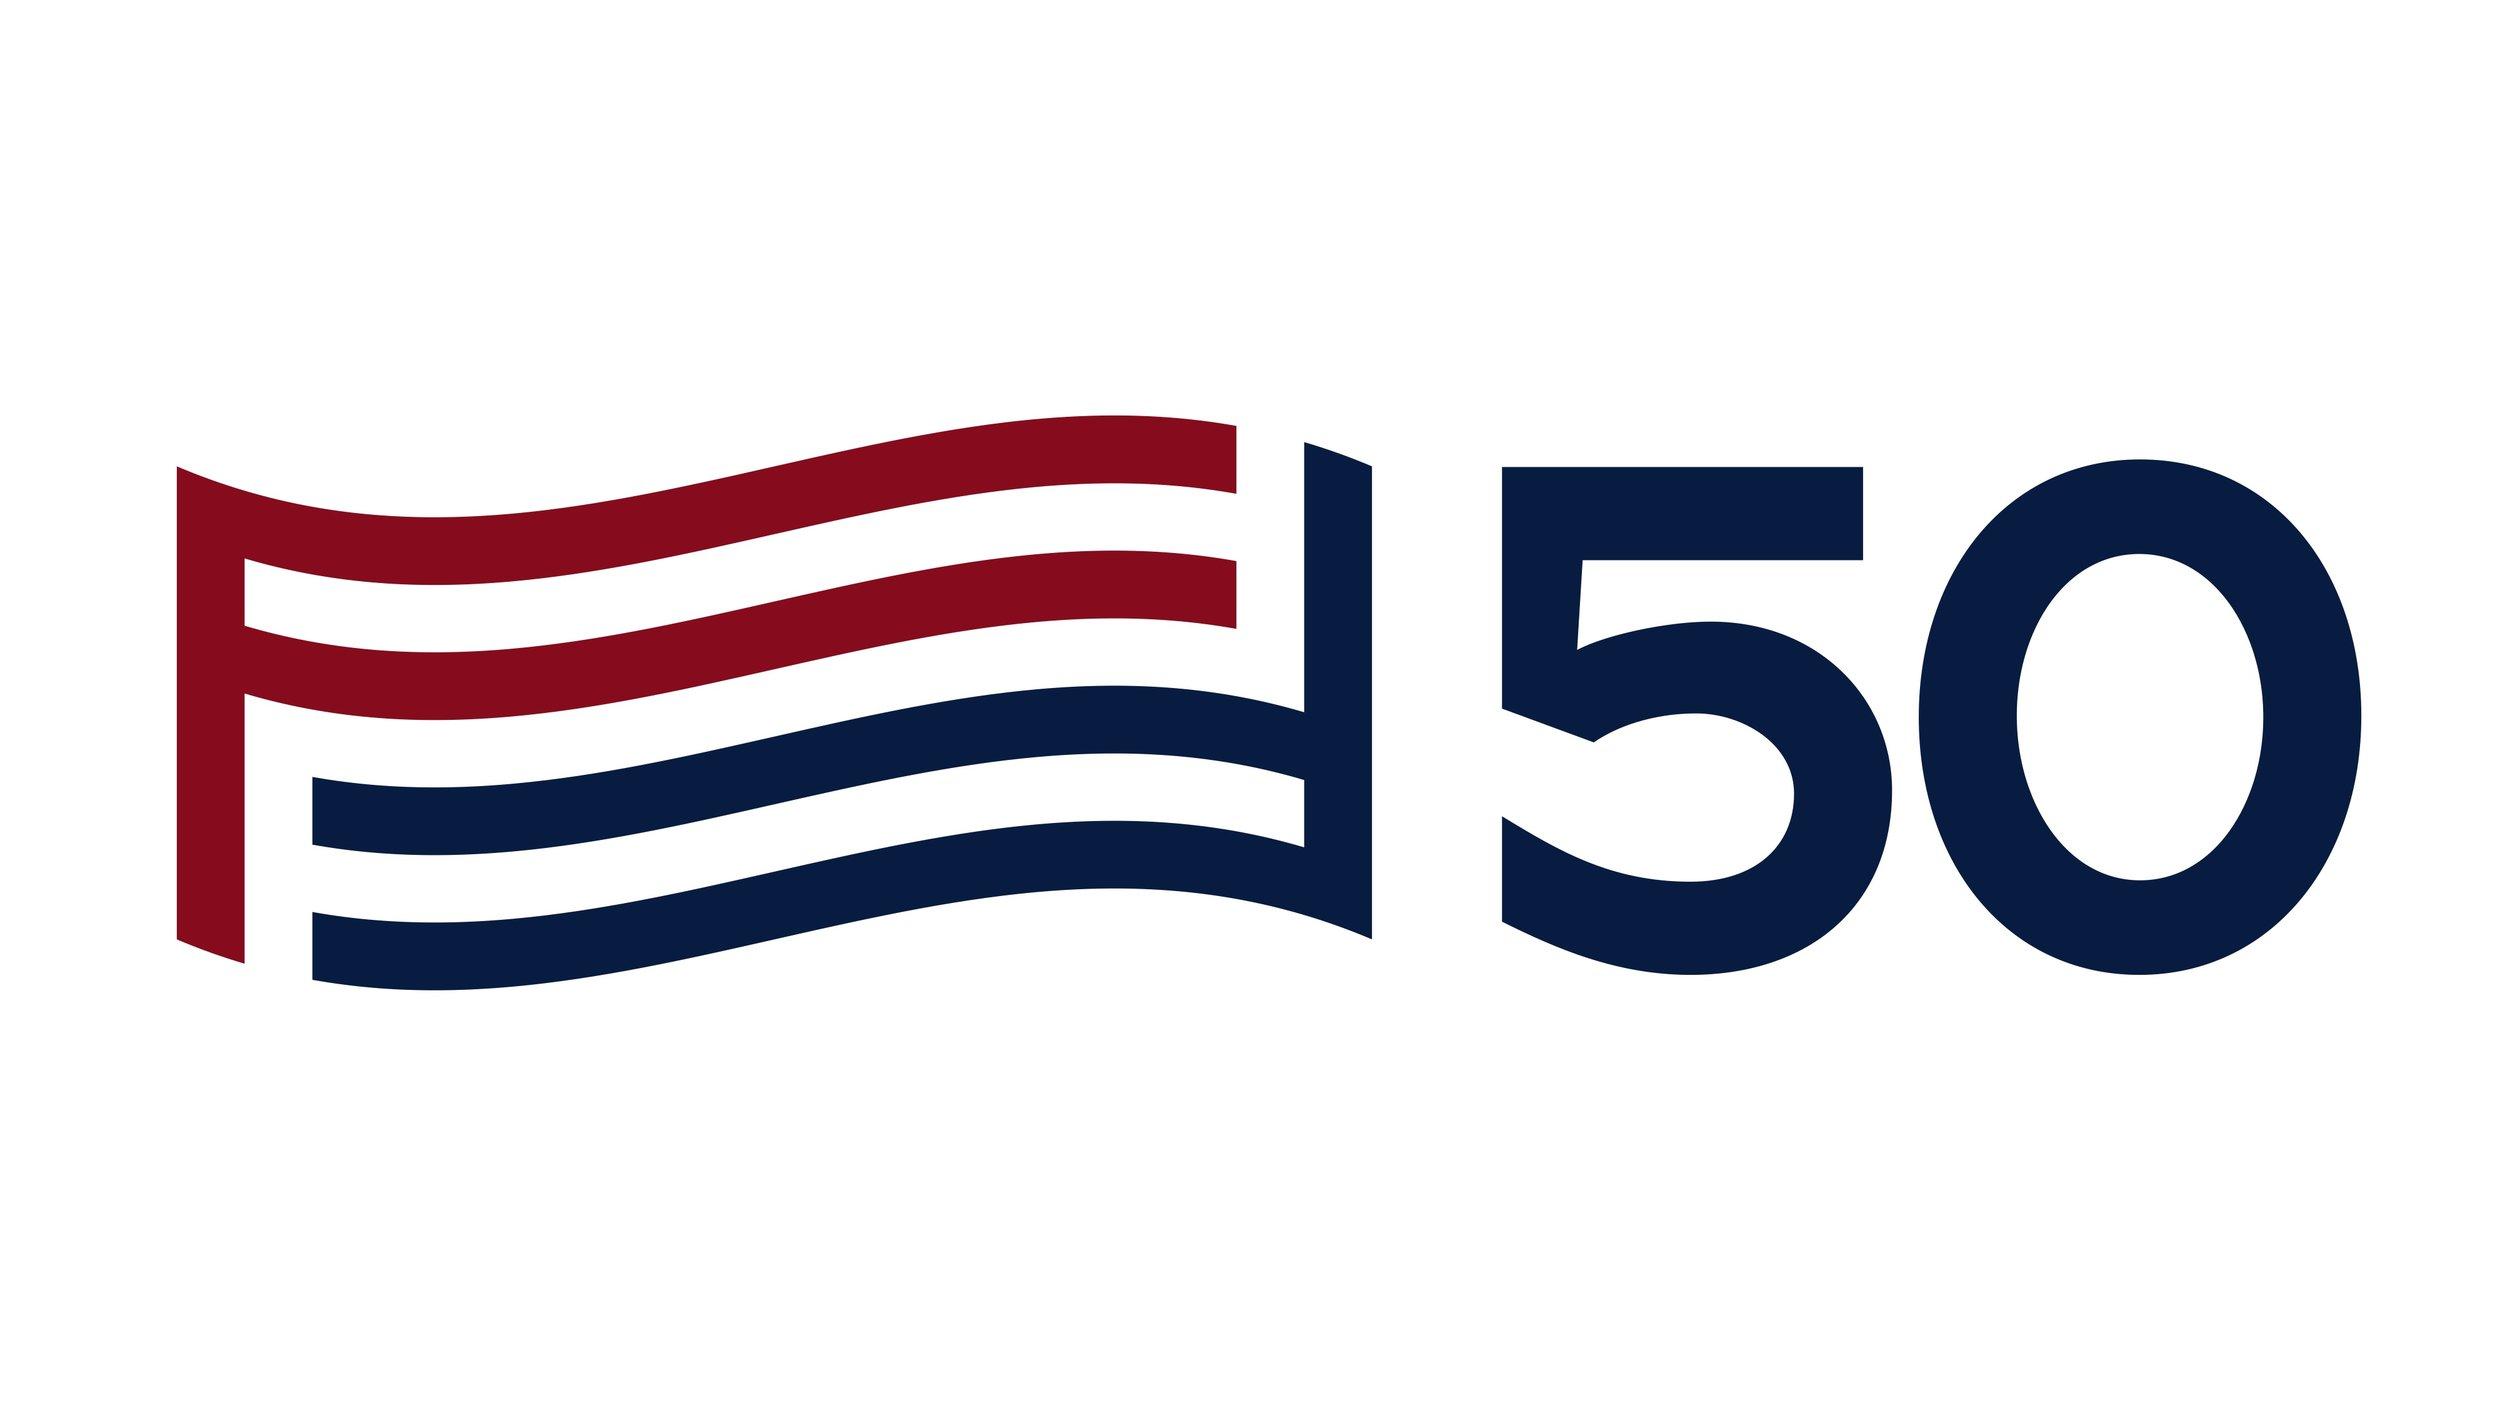 FF 50.jpg